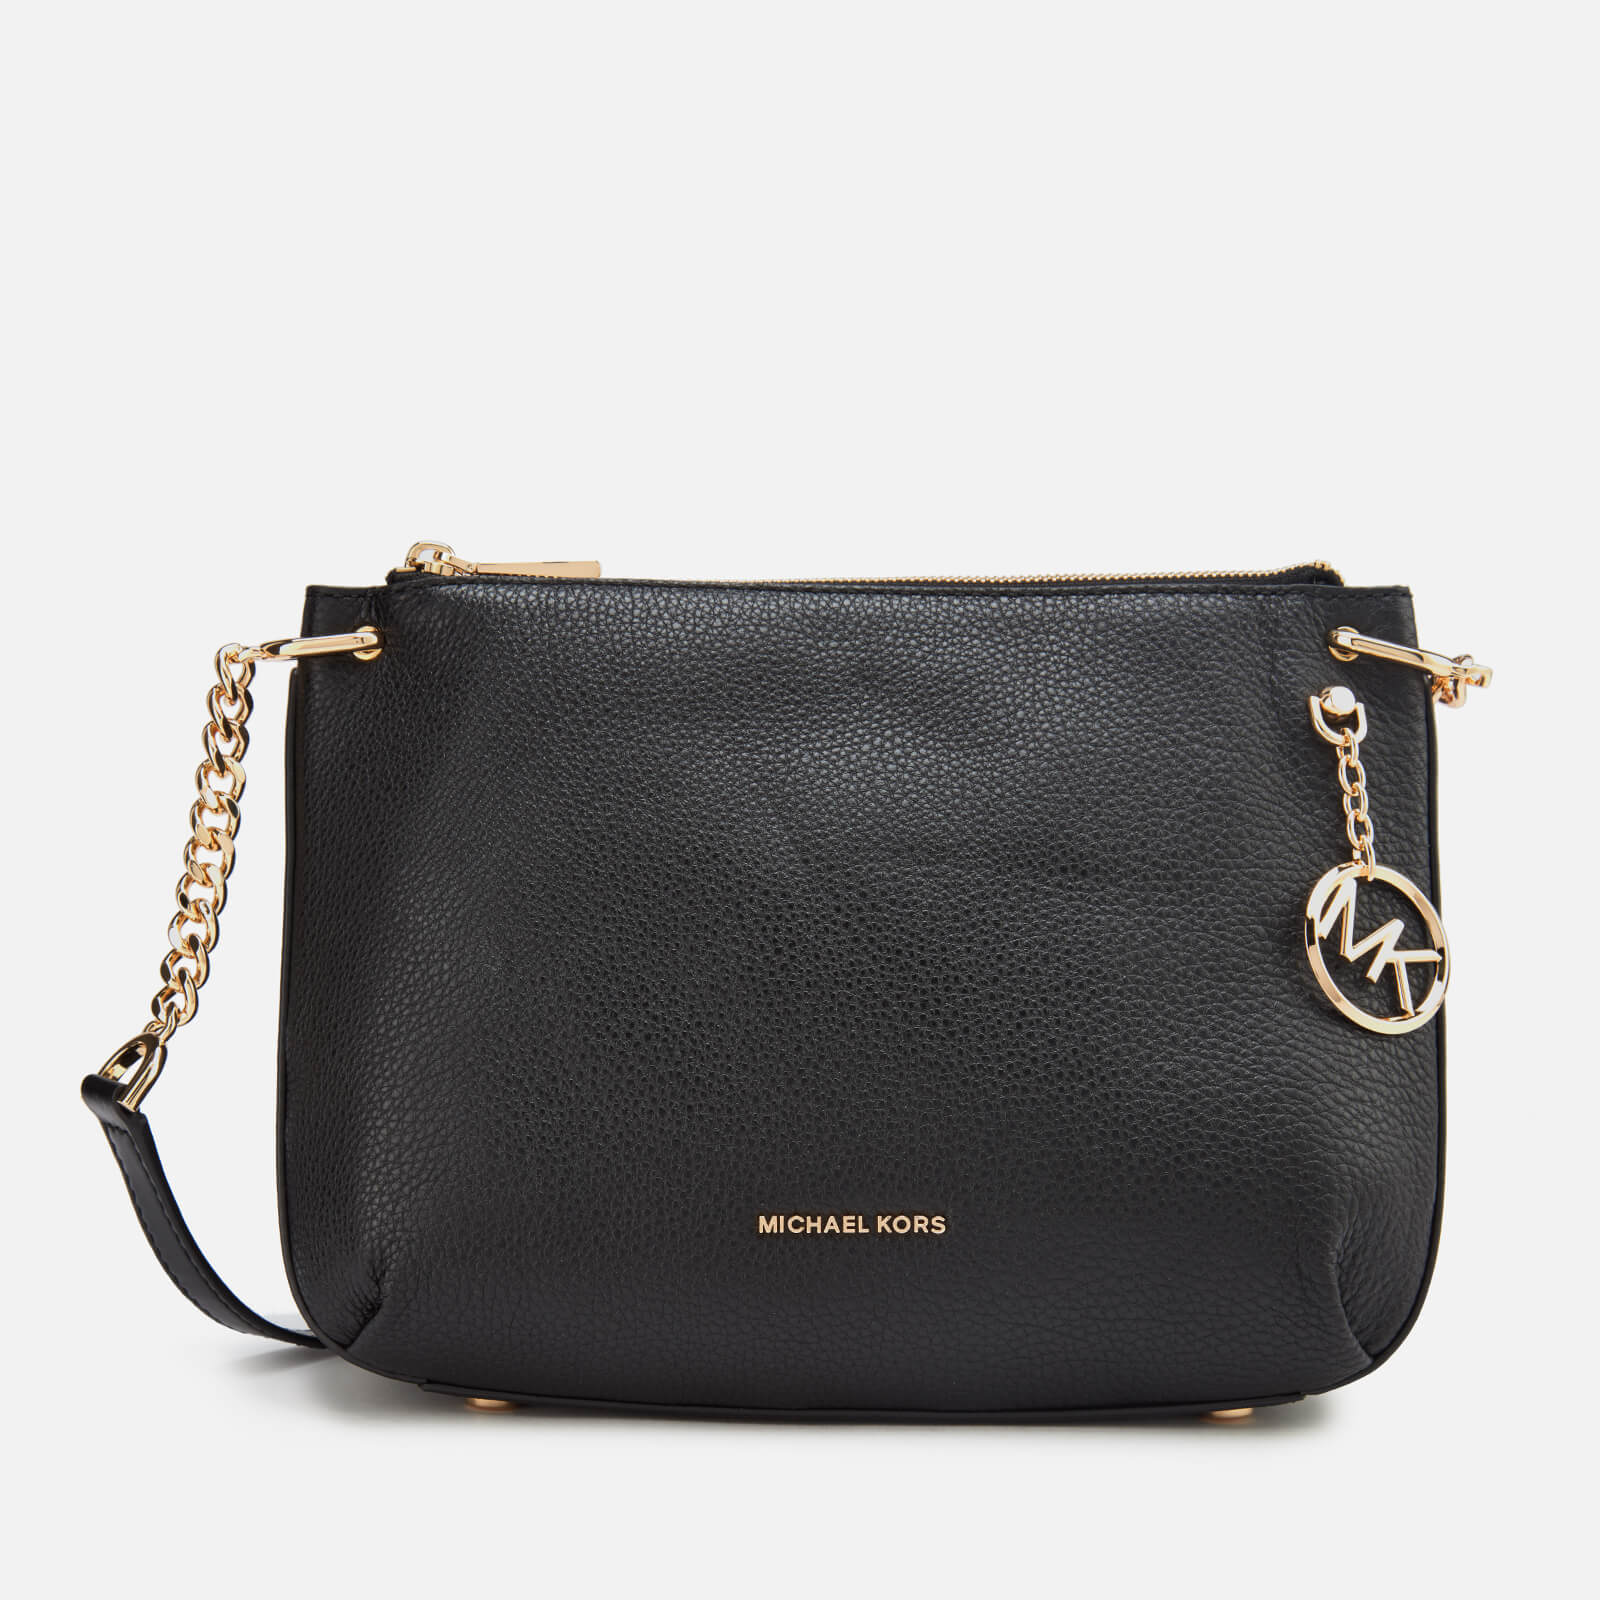 8021665aca05a5 MICHAEL MICHAEL KORS Women's Lillie Large Messenger Bag - Black Womens  Accessories | TheHut.com